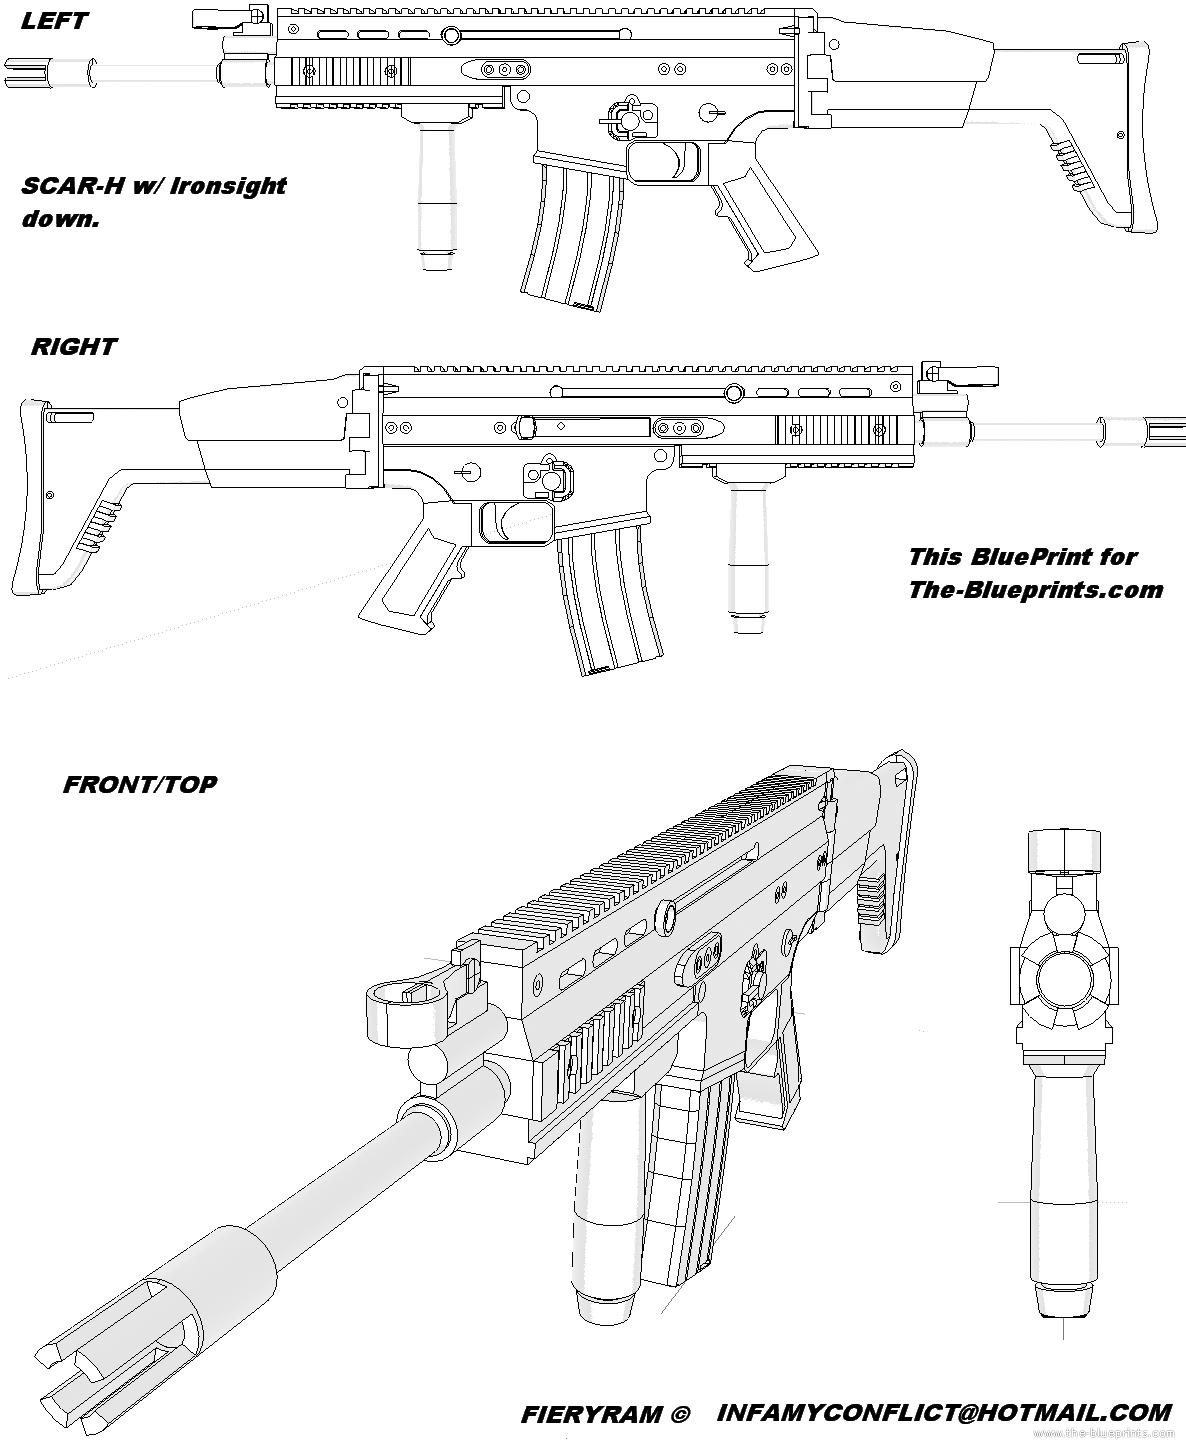 Pin On Gun Blueprints